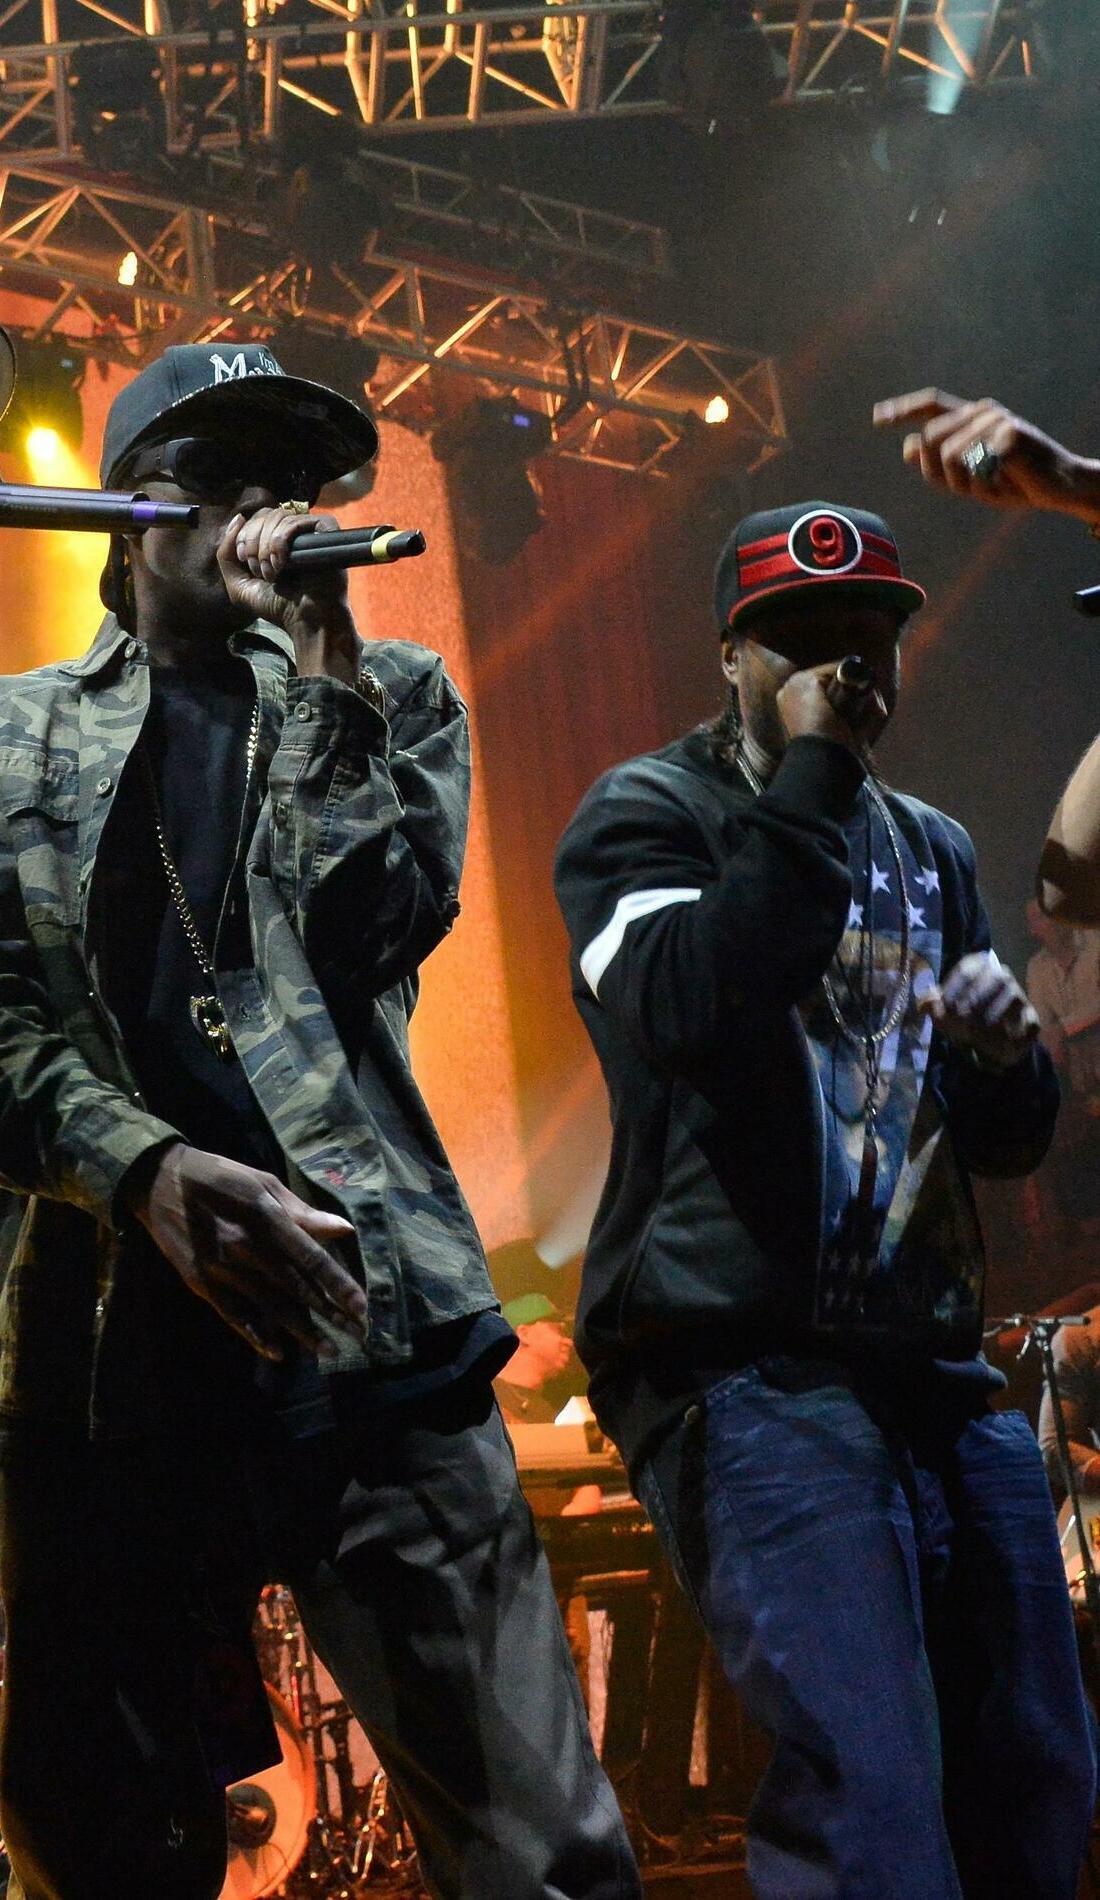 A Bone Thugs-N-Harmony live event